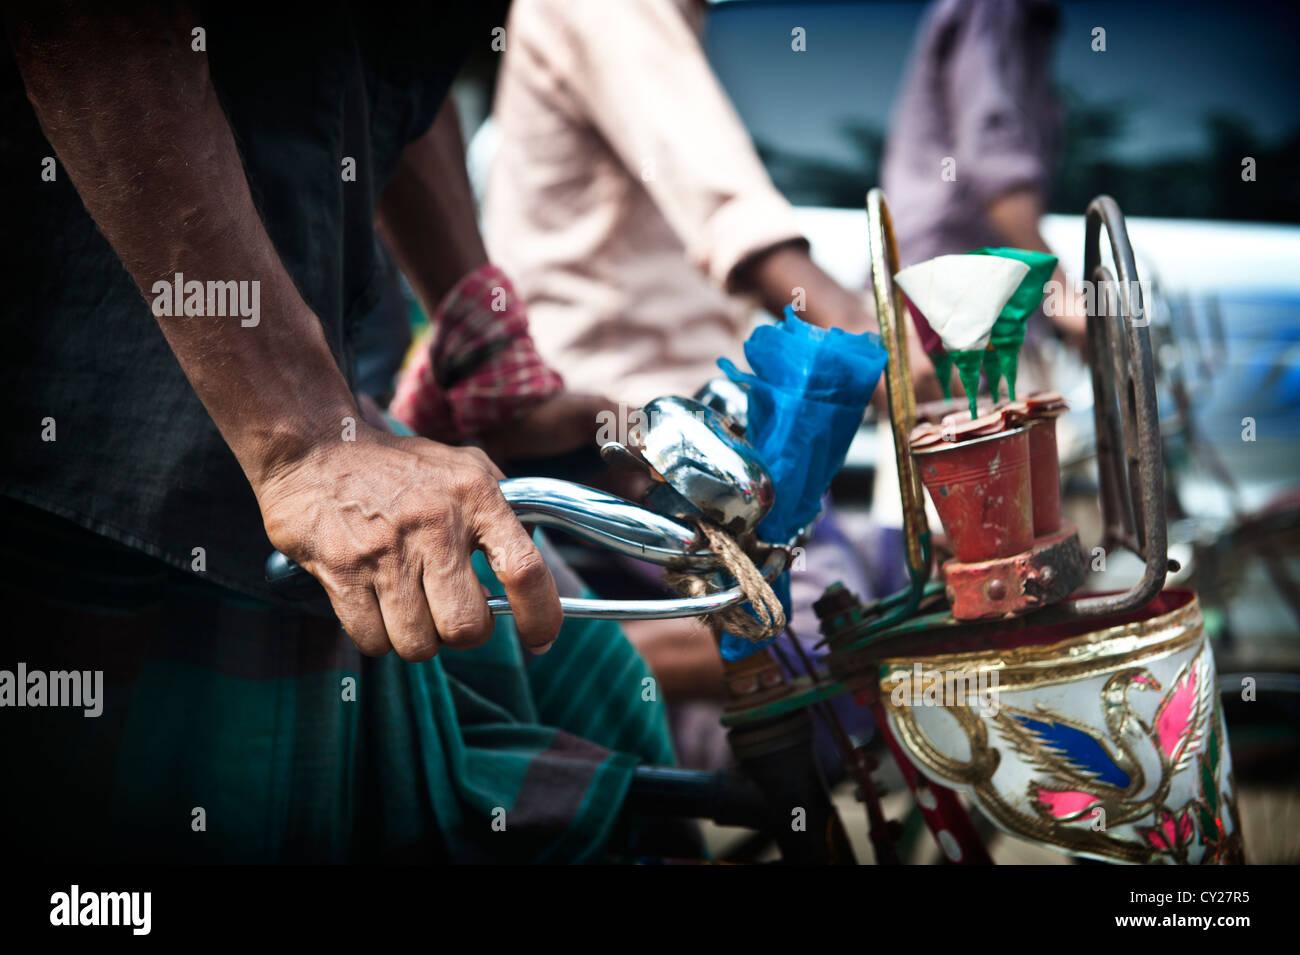 Bangladesh, Dhaka, Bangladeshi, rickshaw - Stock Image